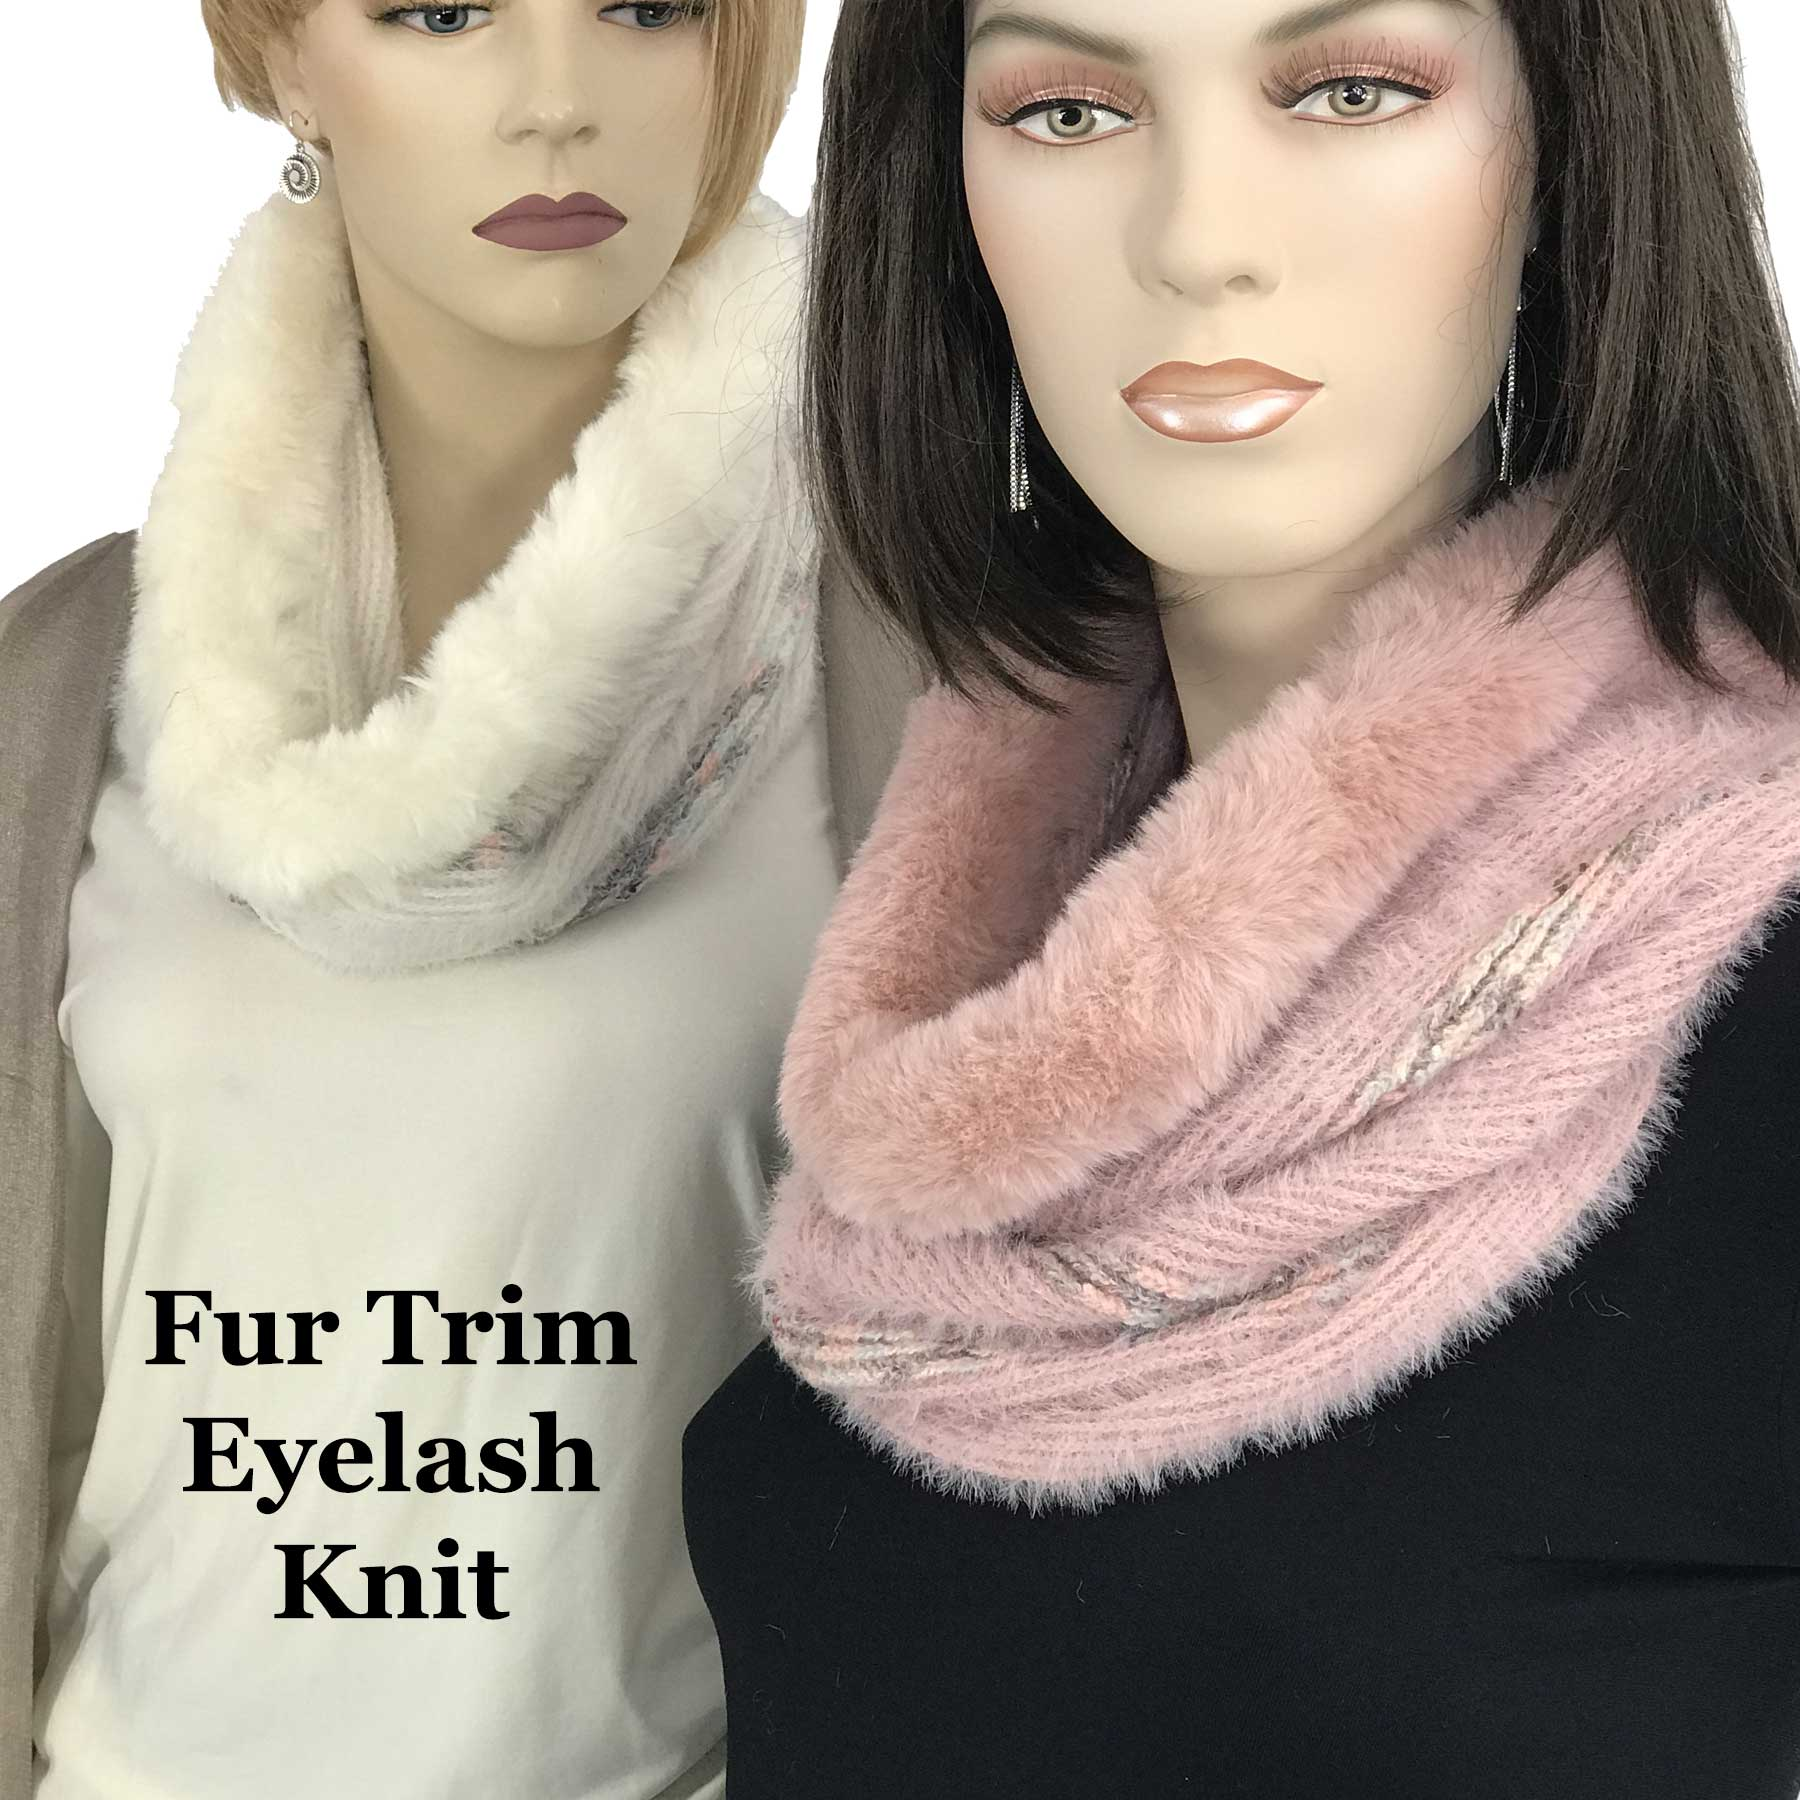 Cowl Neck Scarves - Fur Trim Eyelash Knit 9493